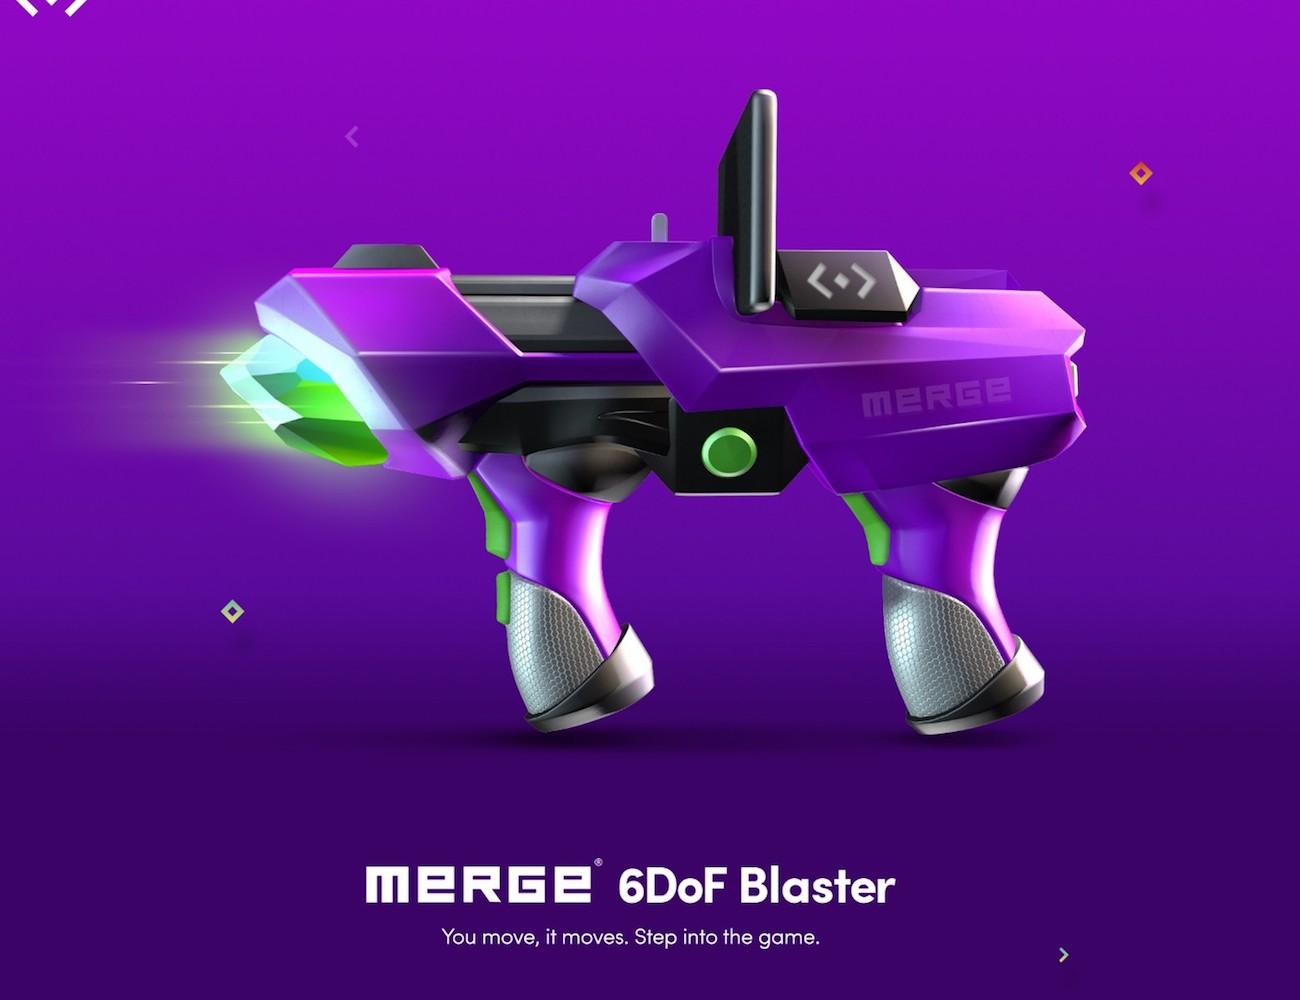 Merge VR 6DoF Blaster Game Controller